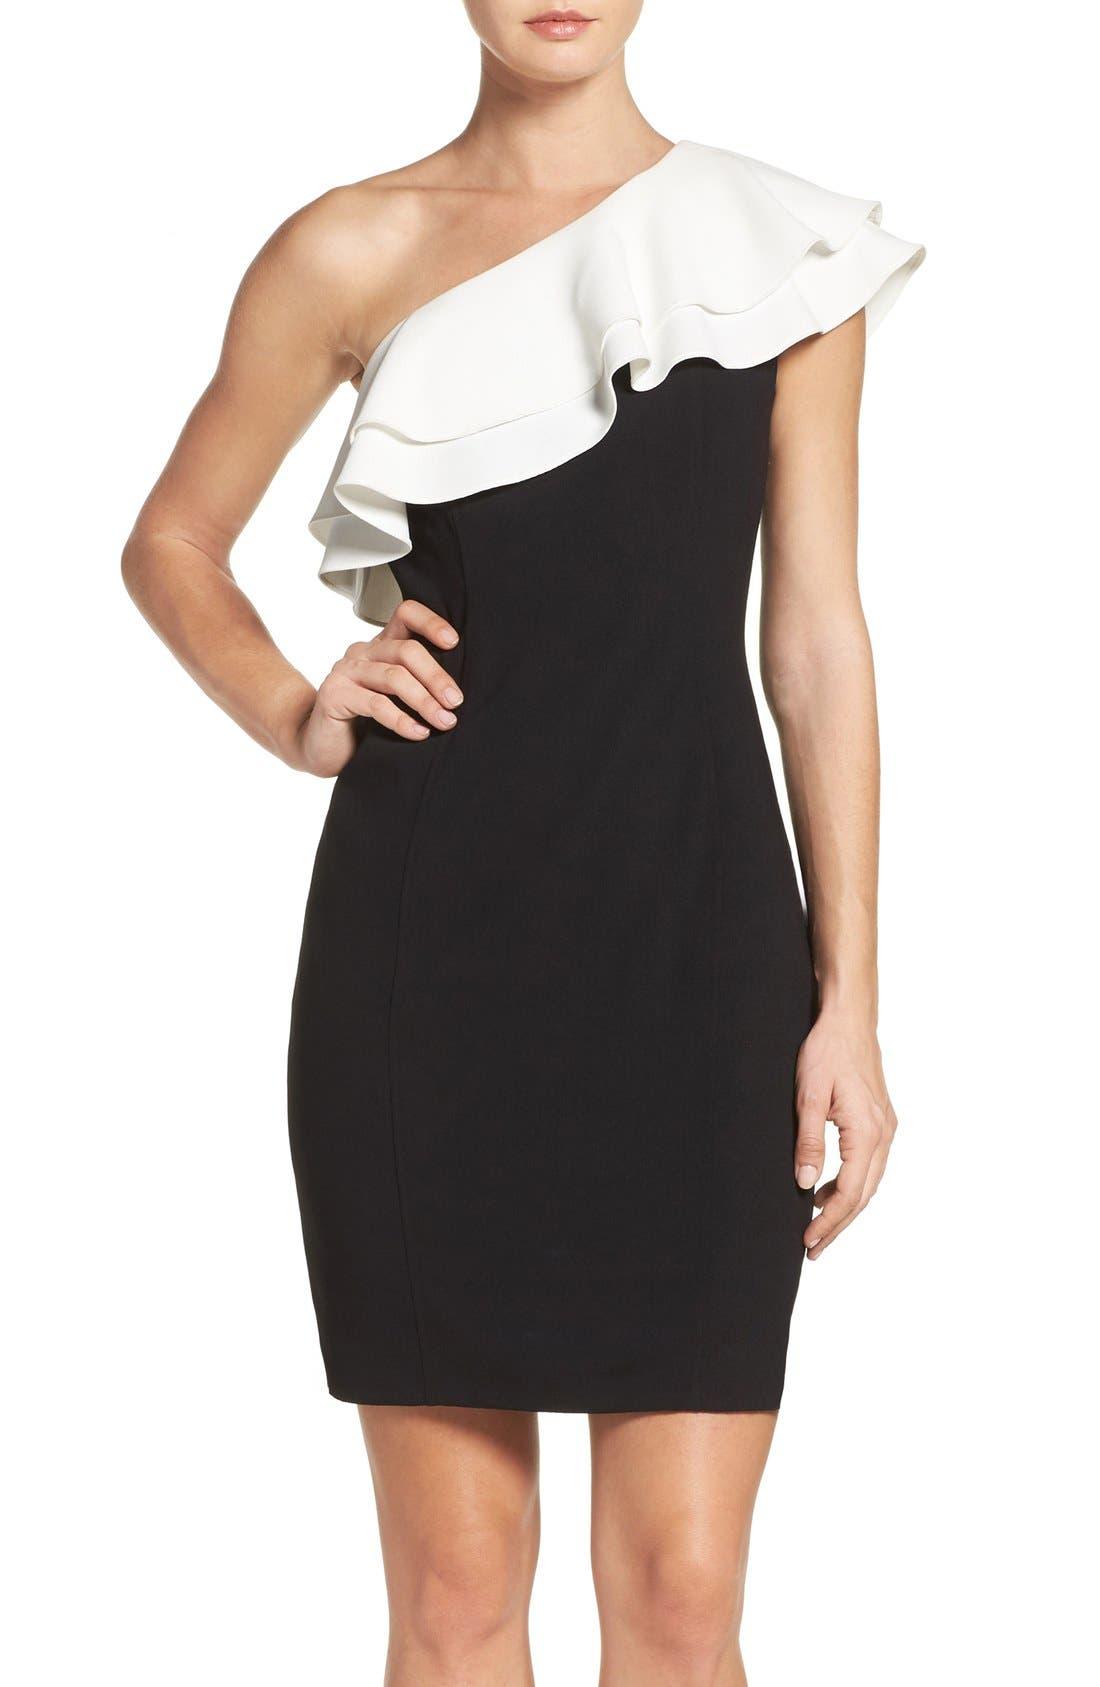 Alternate Image 1 Selected - Aidan by Aidan Mattox One-Shoulder Dress